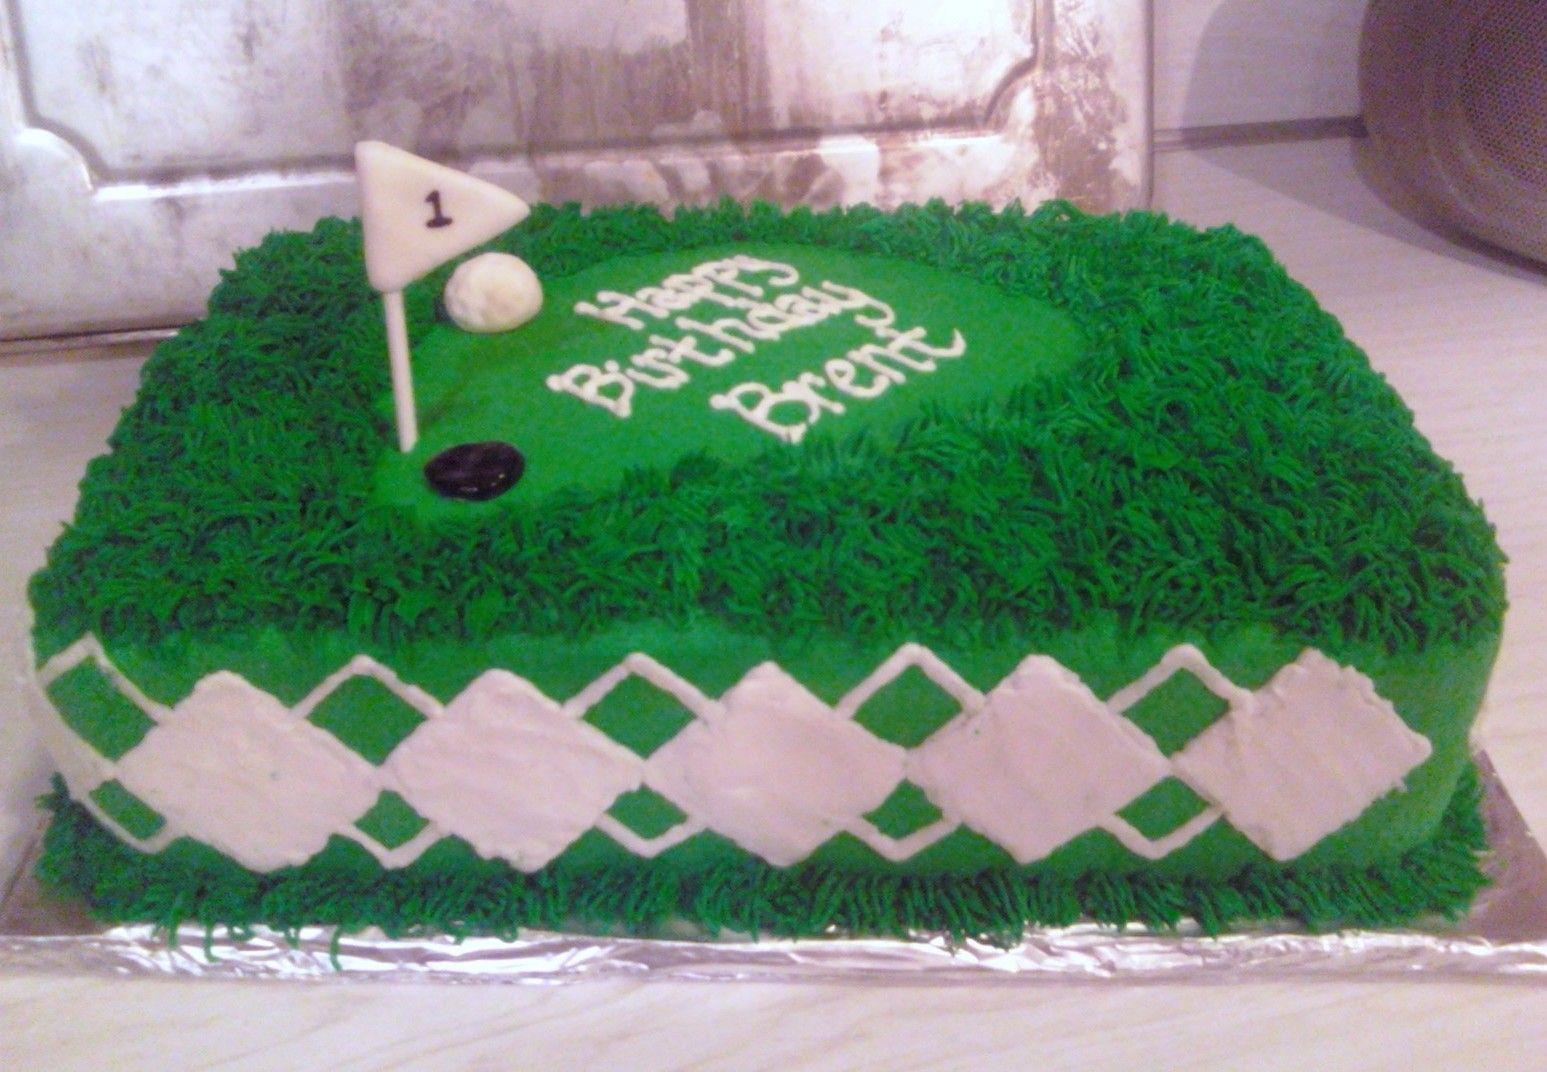 Sarah's Cake Haven Golf birthday cakes, Golf cake